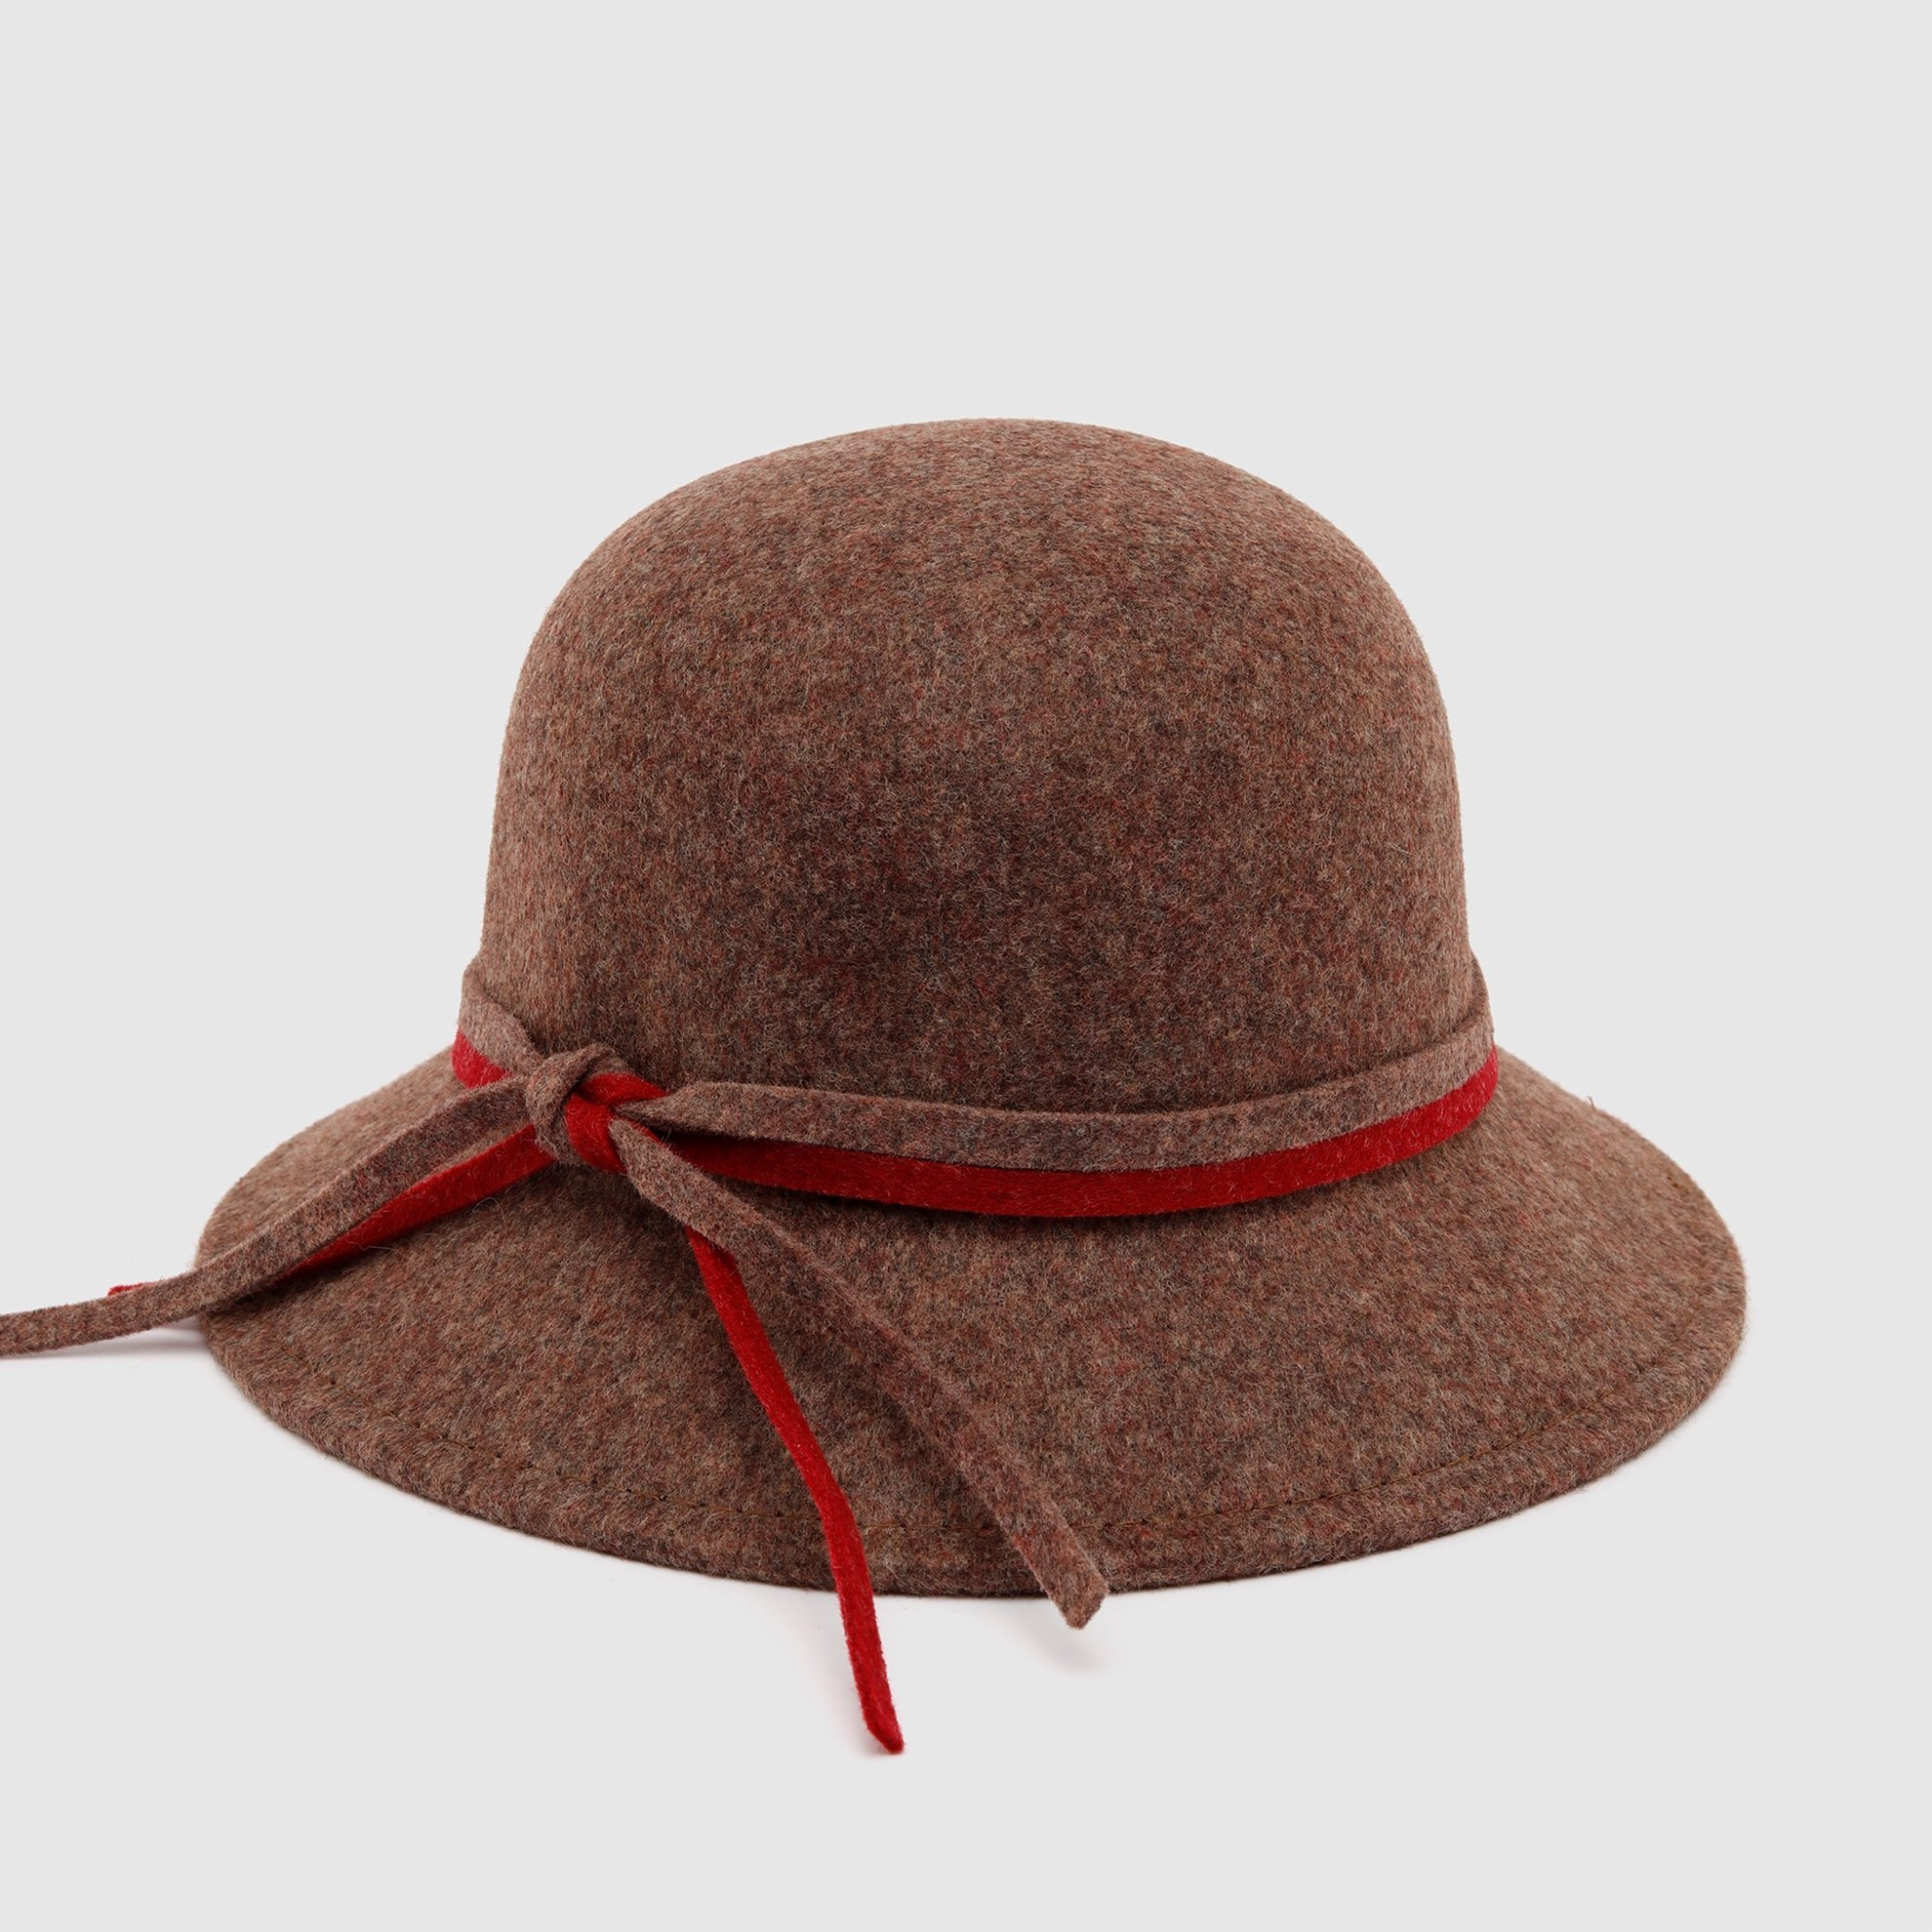 resm Fiyonk Detaylı Şapka